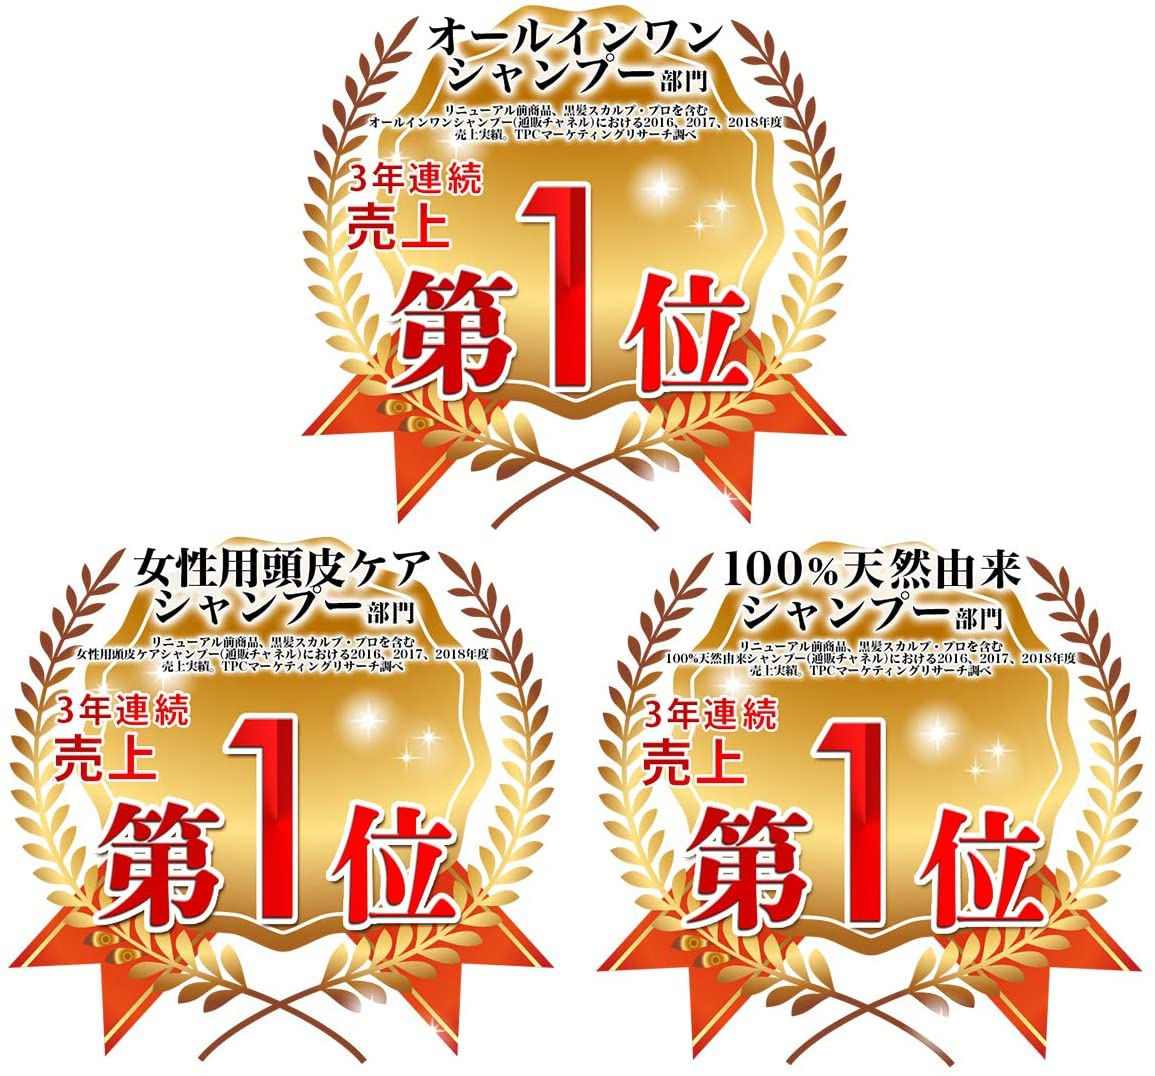 haru(ハル)kurokami スカルプの商品画像11